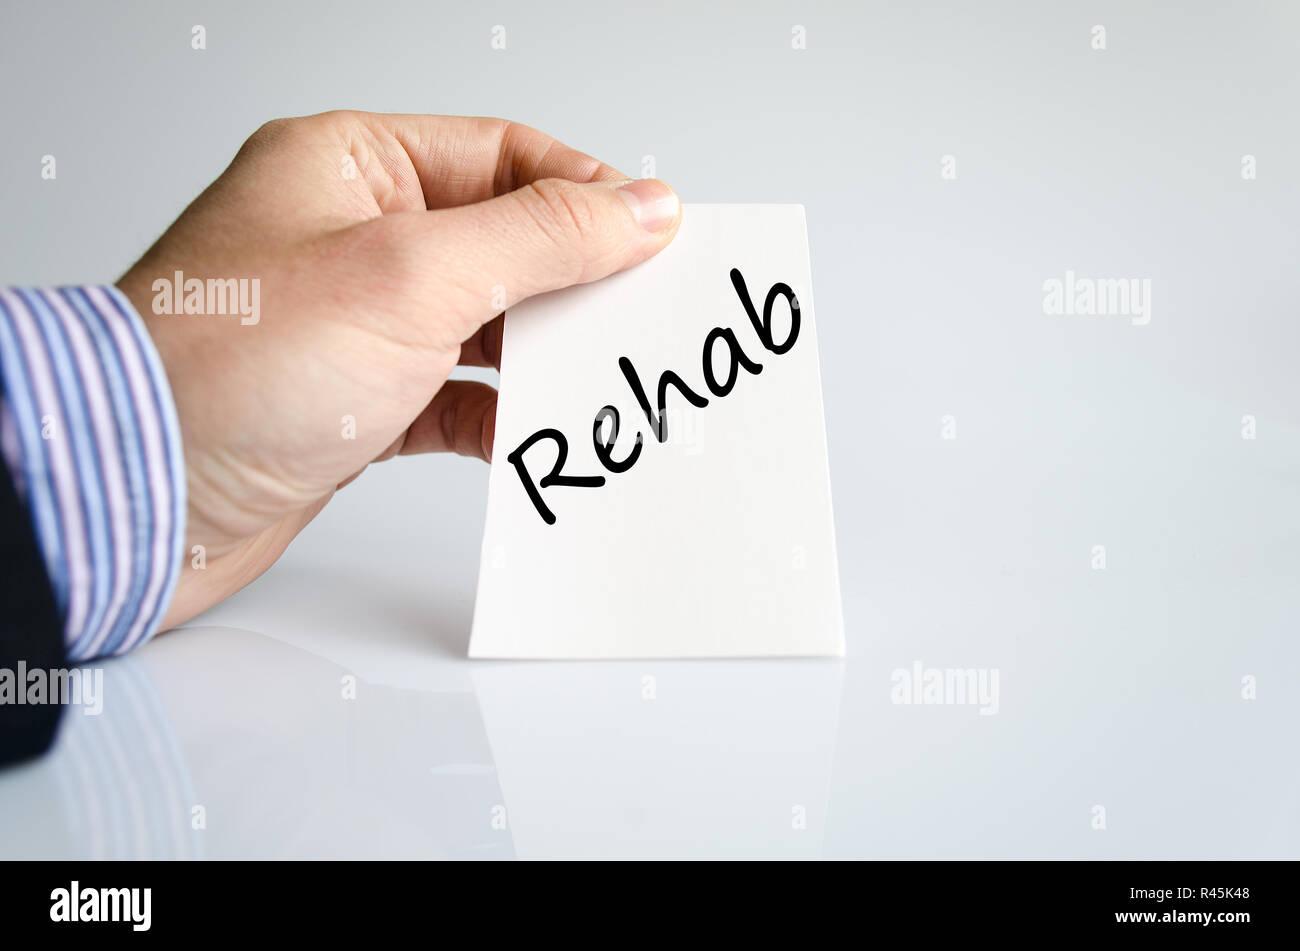 Rehab text concept - Stock Image